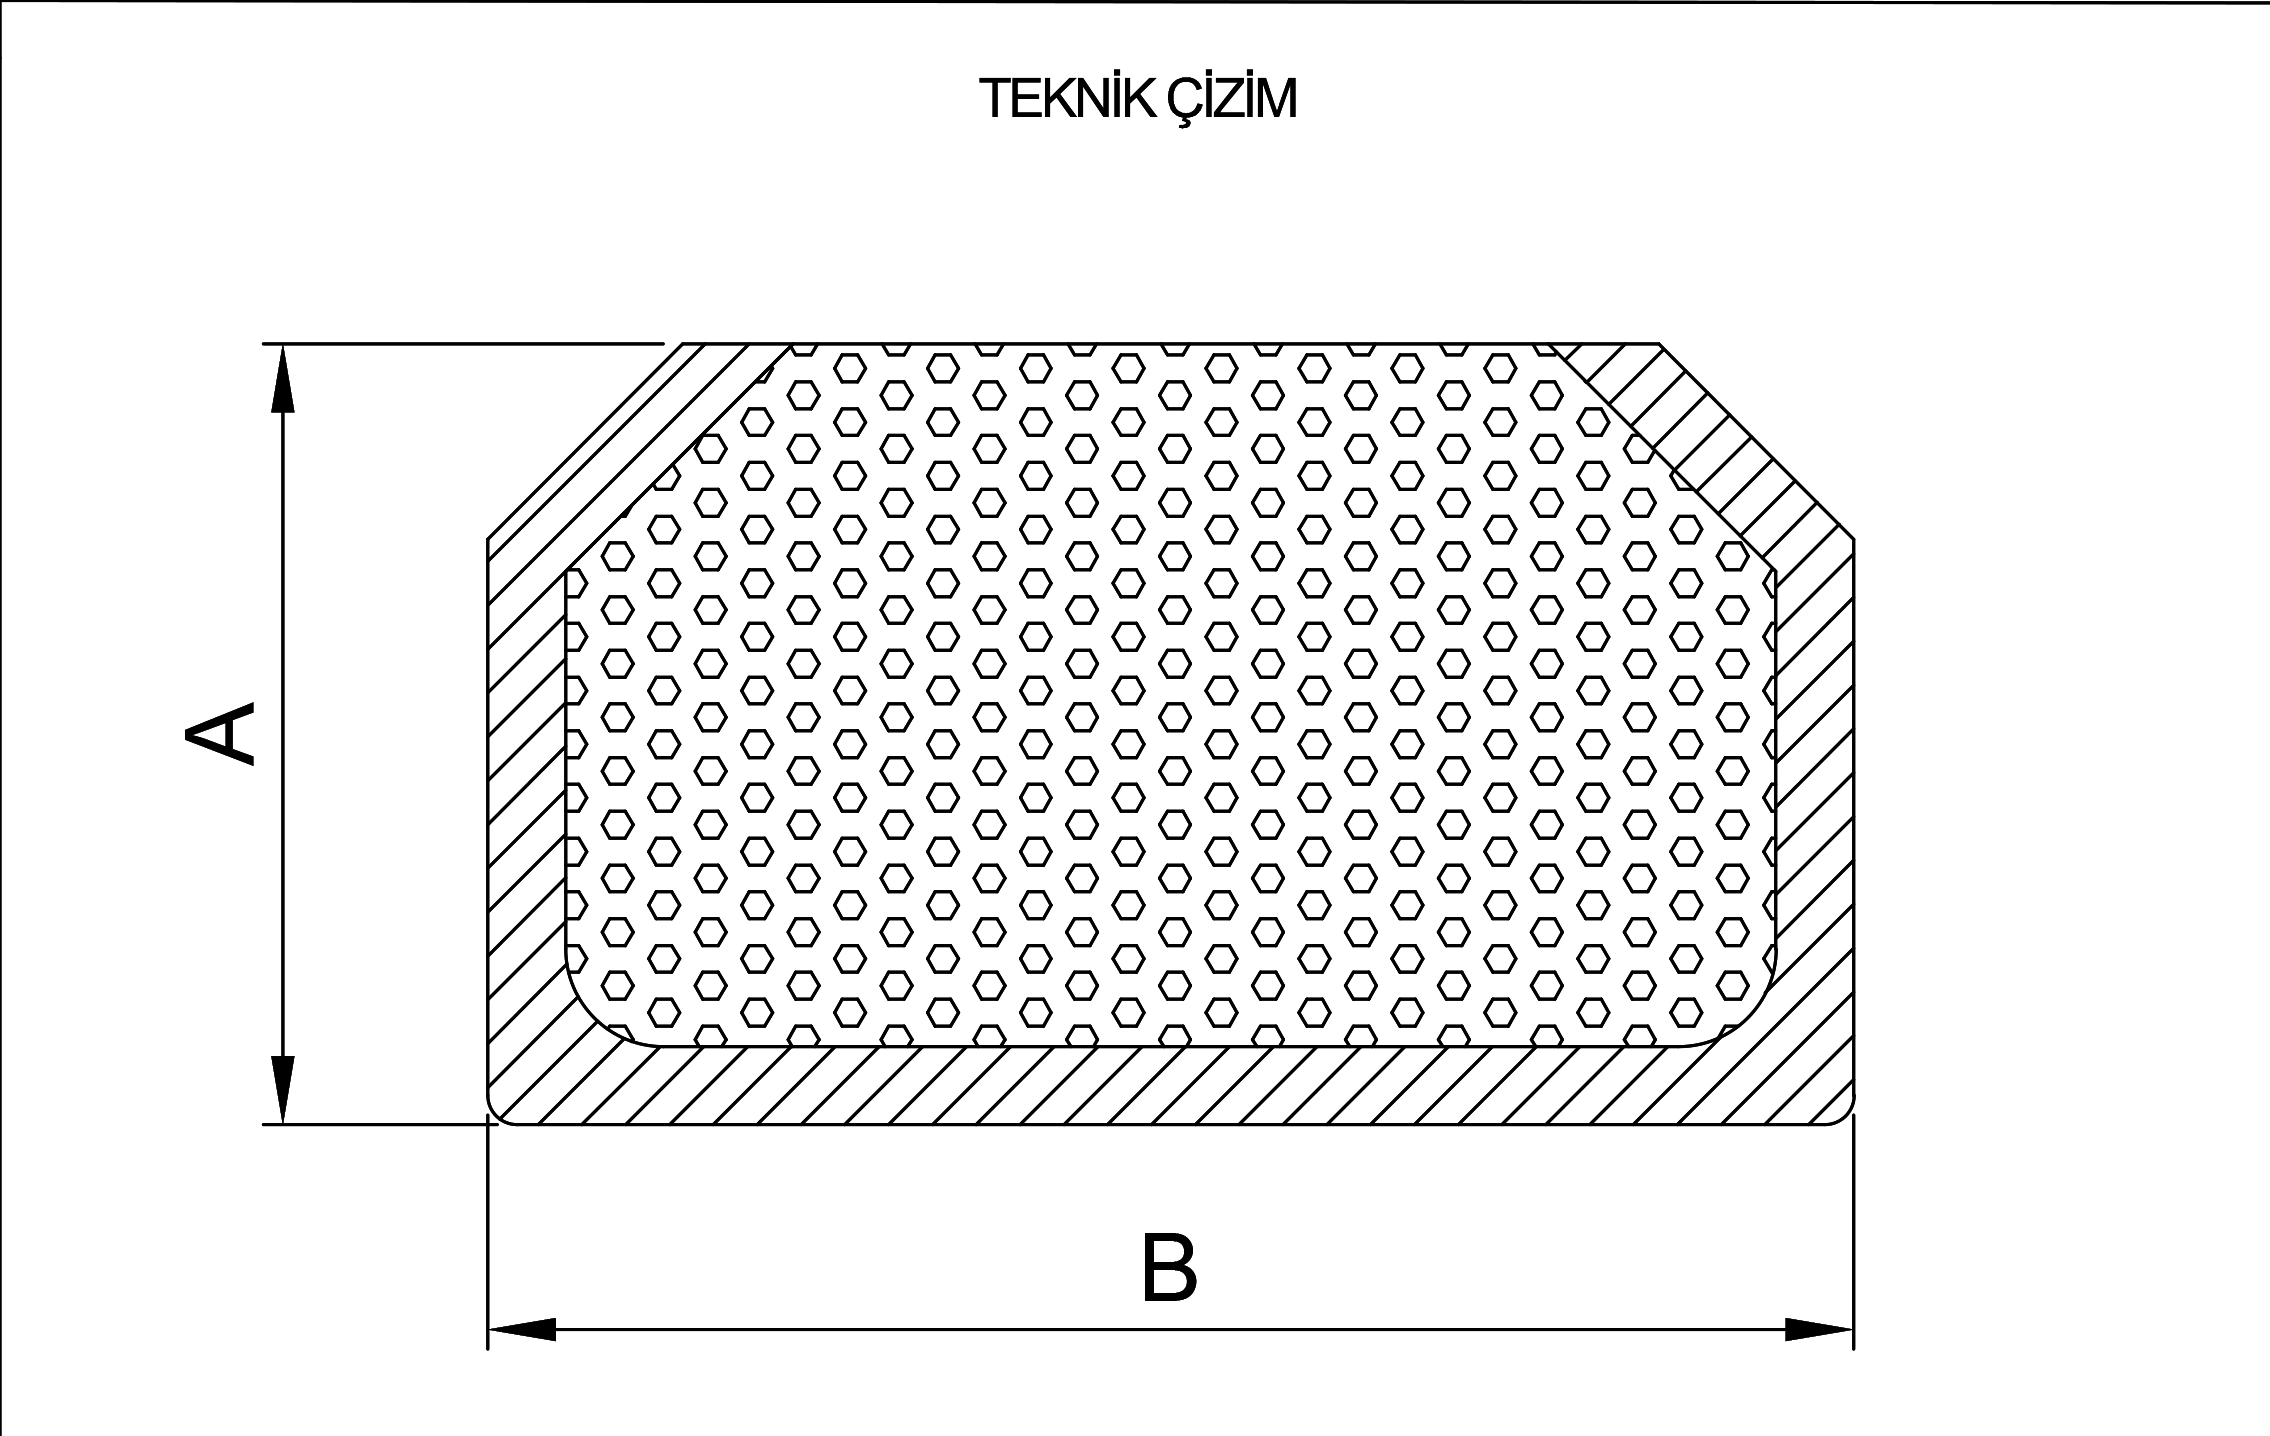 gemi-ambar-conta-listesi-1